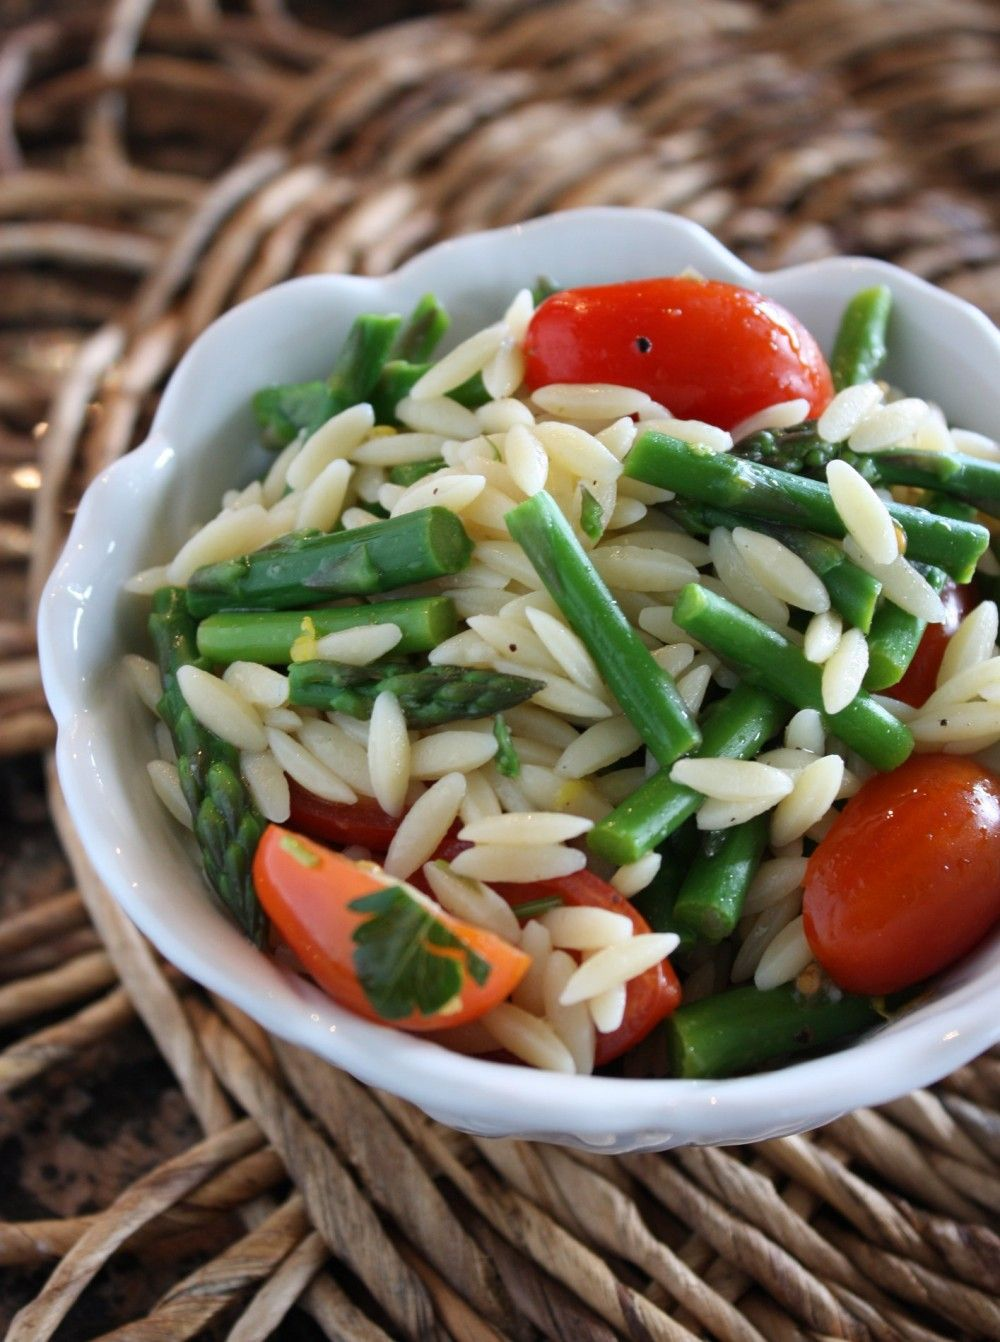 Lemon Orzo Salad with Asparagus and Tomatoes